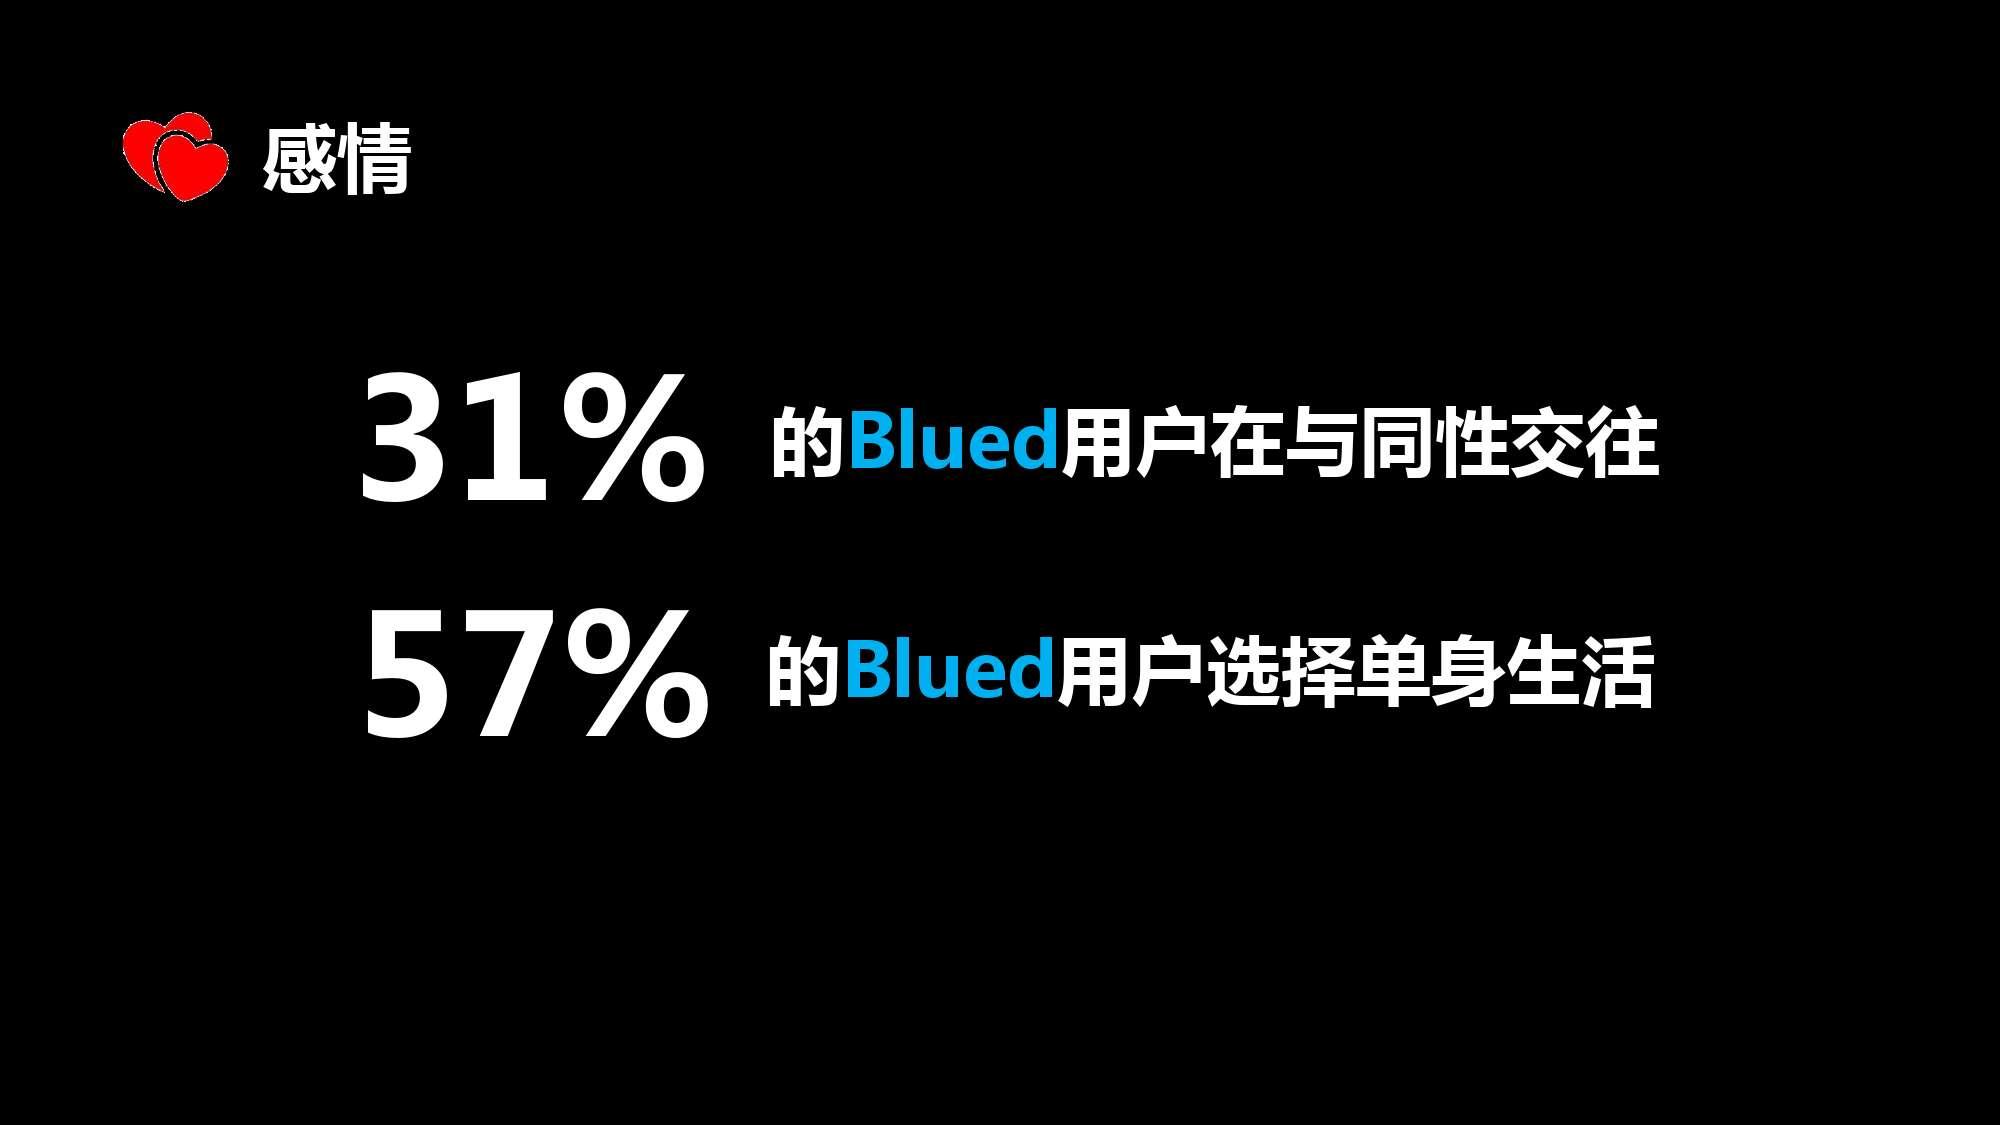 Blued2015中国同志社群大数据白皮书_000015